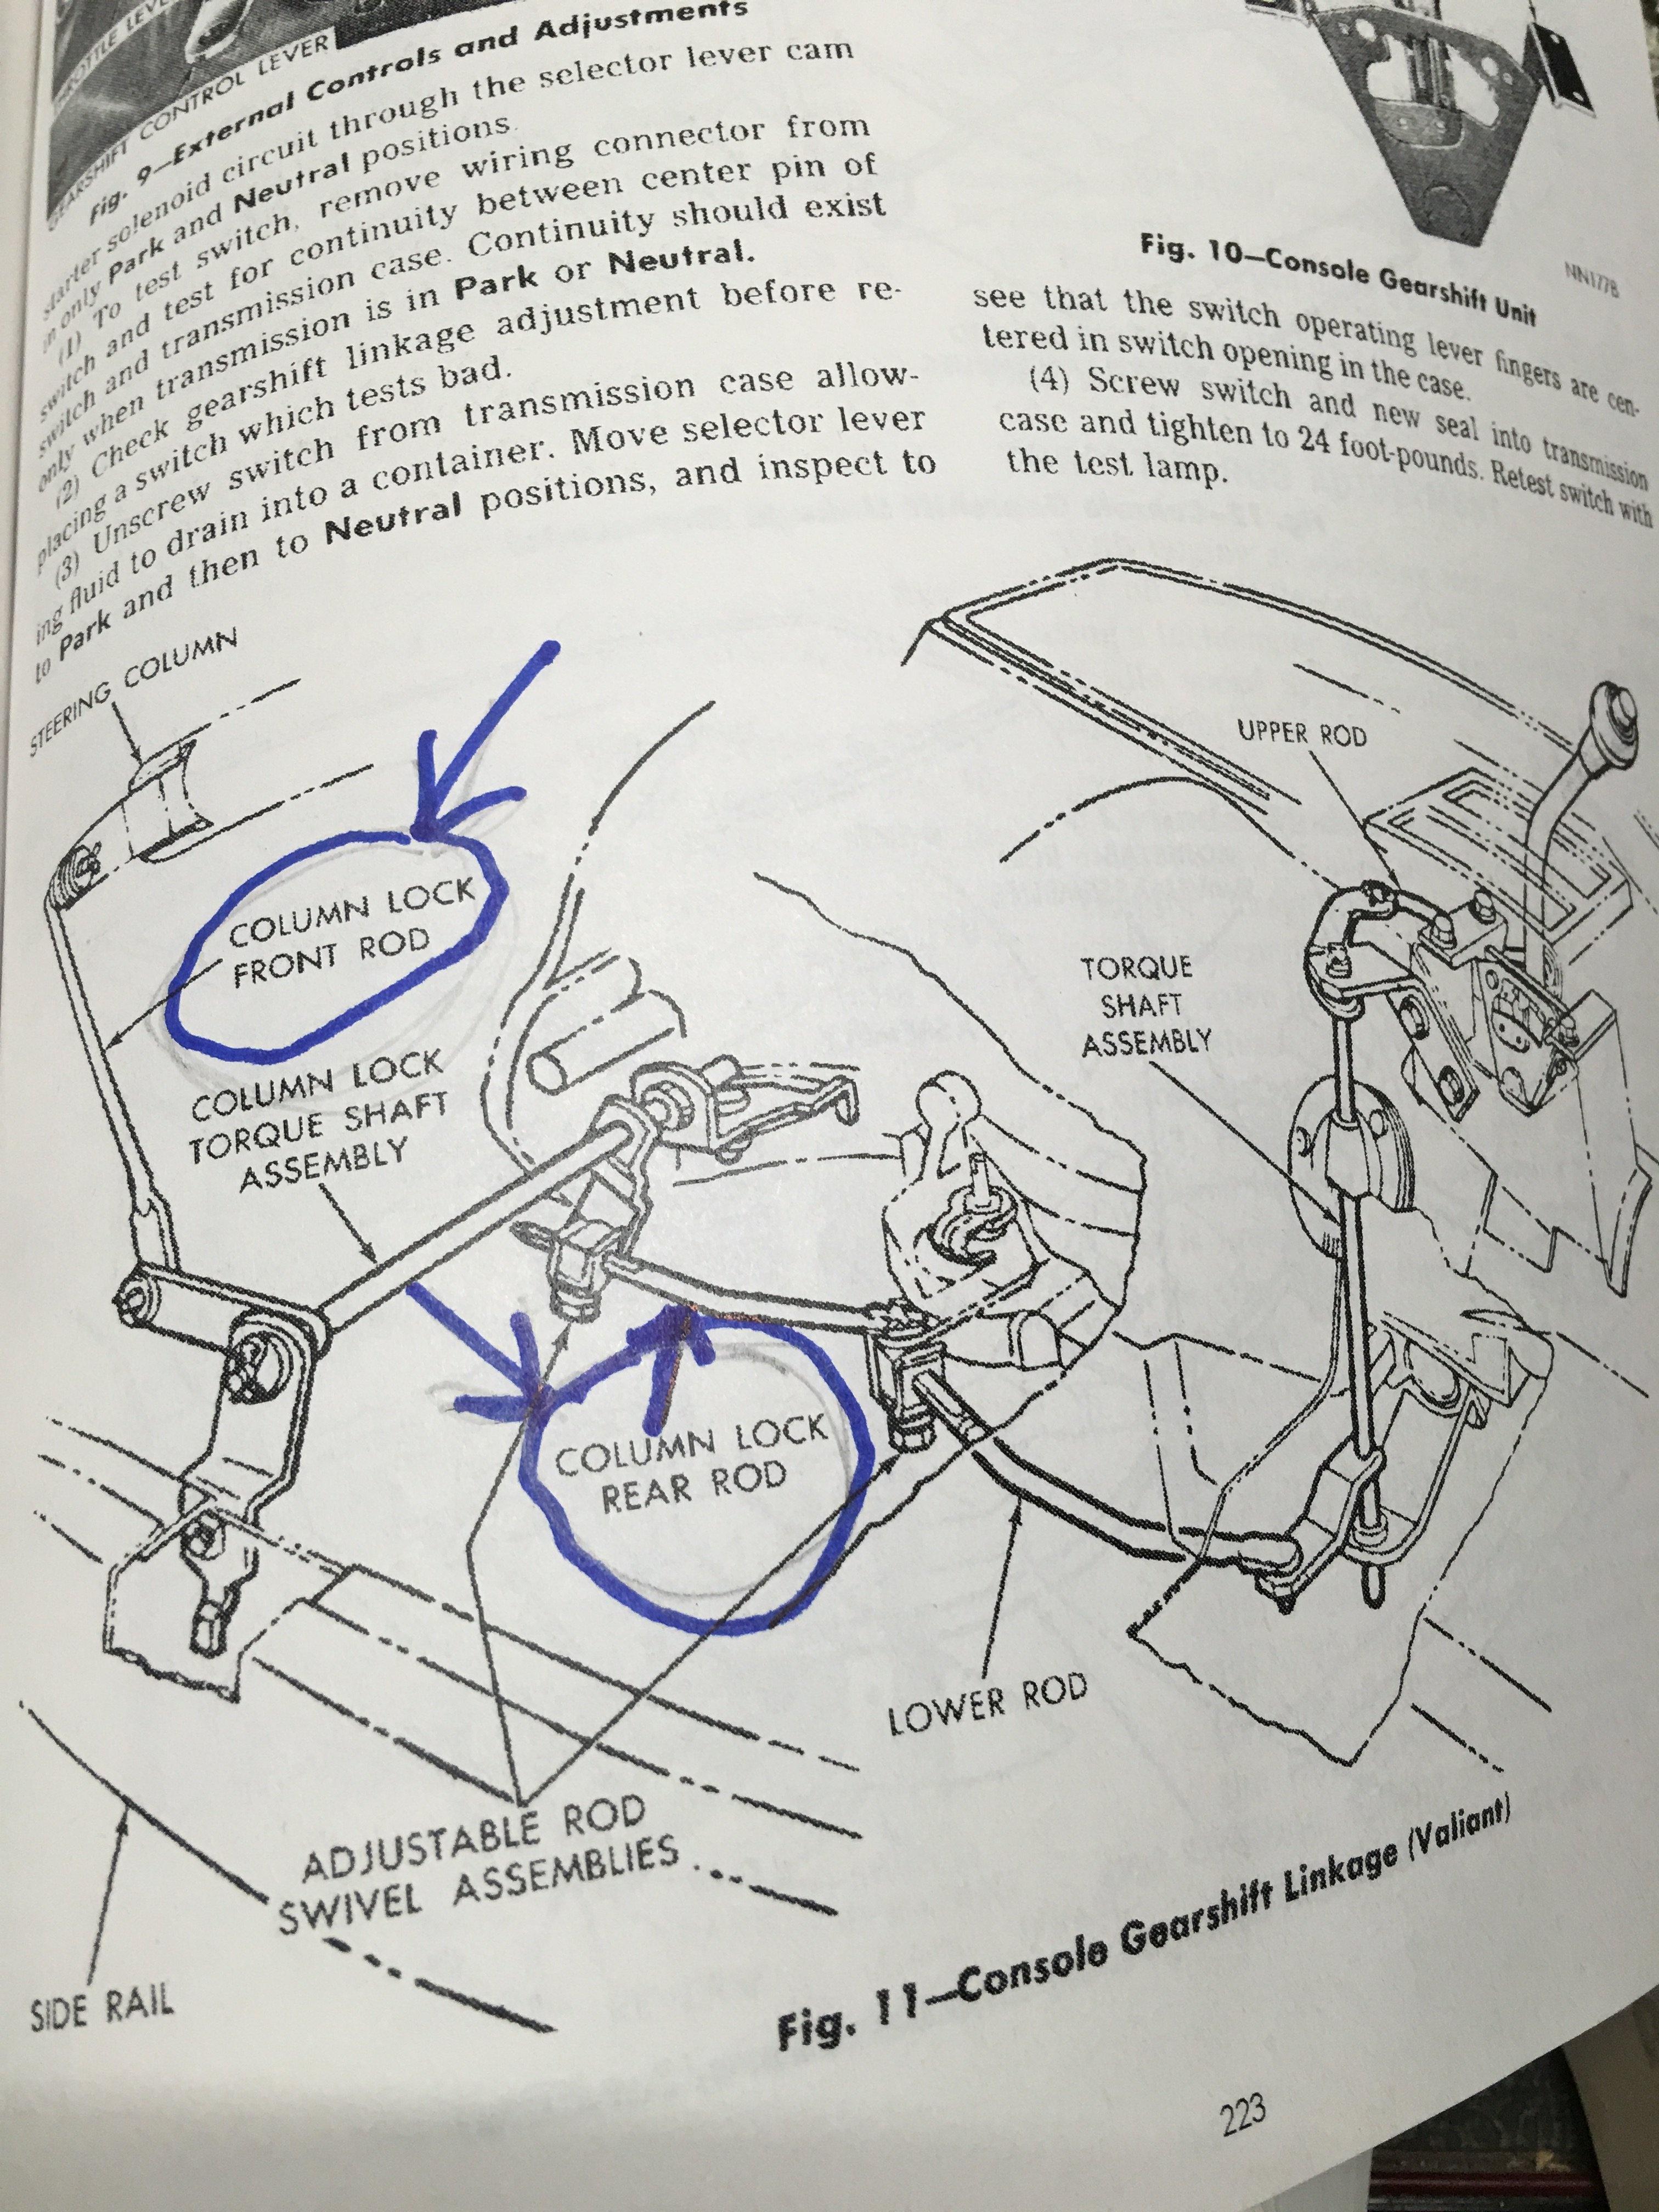 dodge 727 transmission diagram db 8495  727 transmission parts diagram wiring diagram  transmission parts diagram wiring diagram